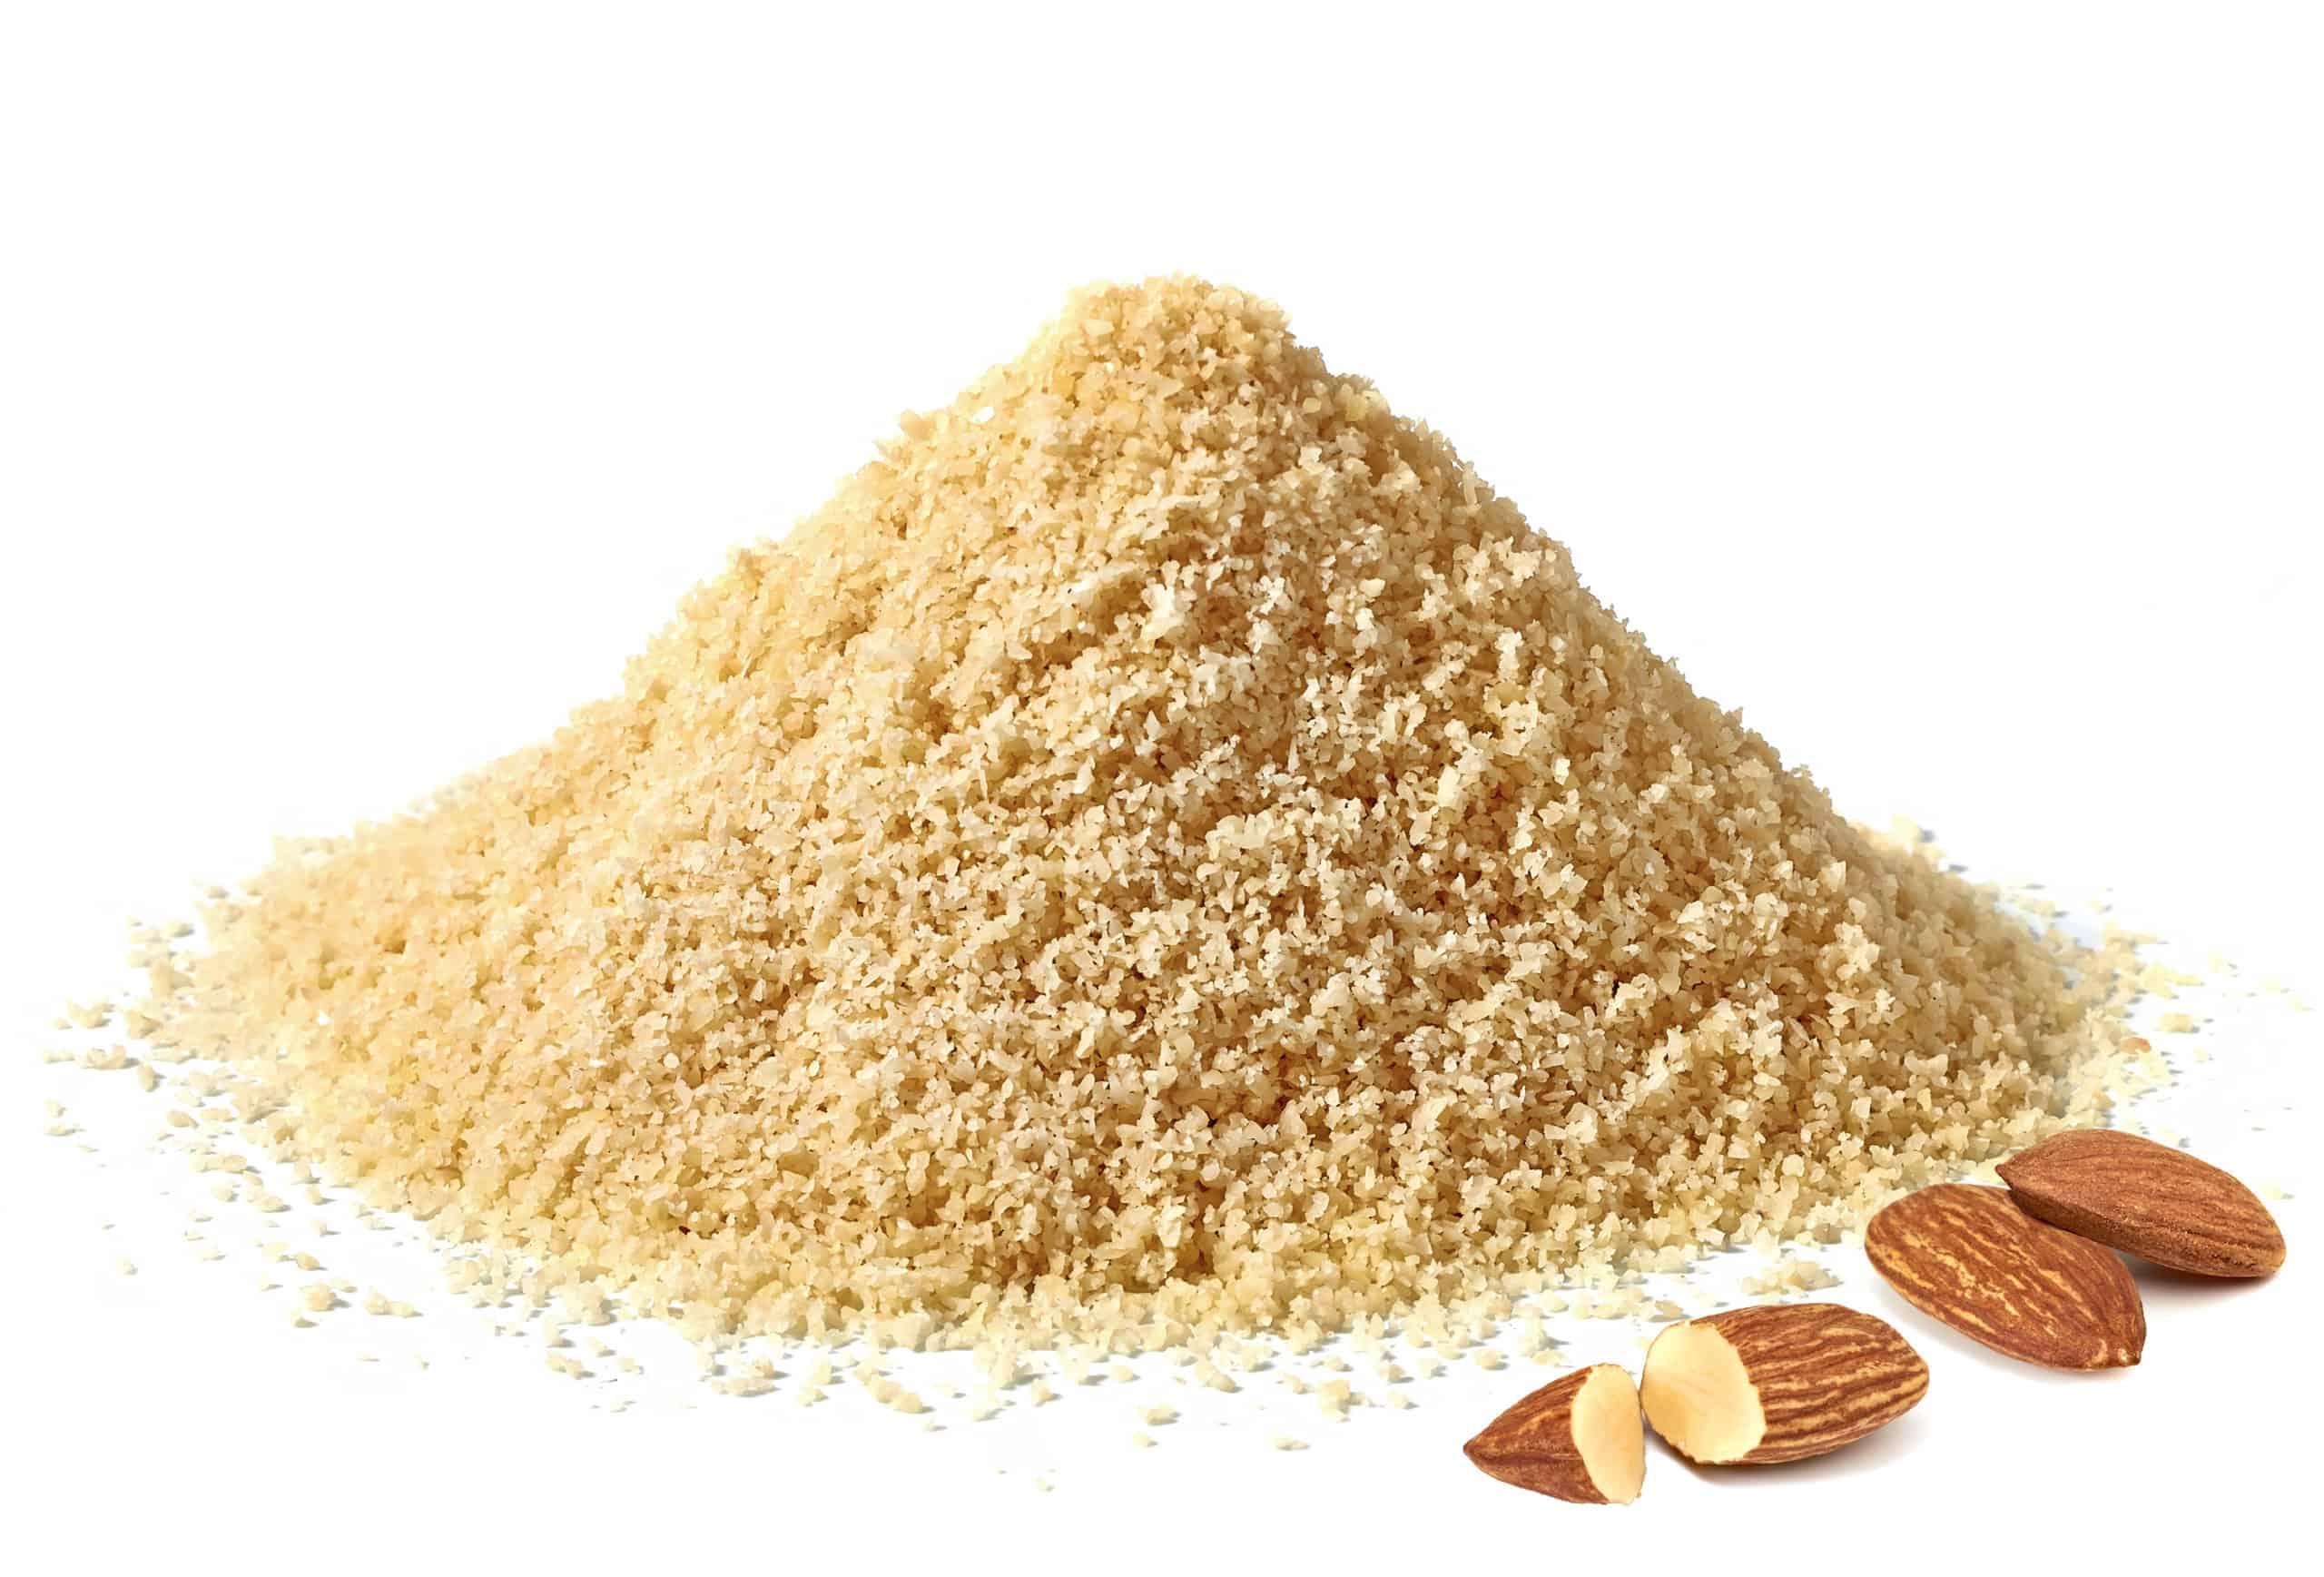 Benefits of Almond Flour